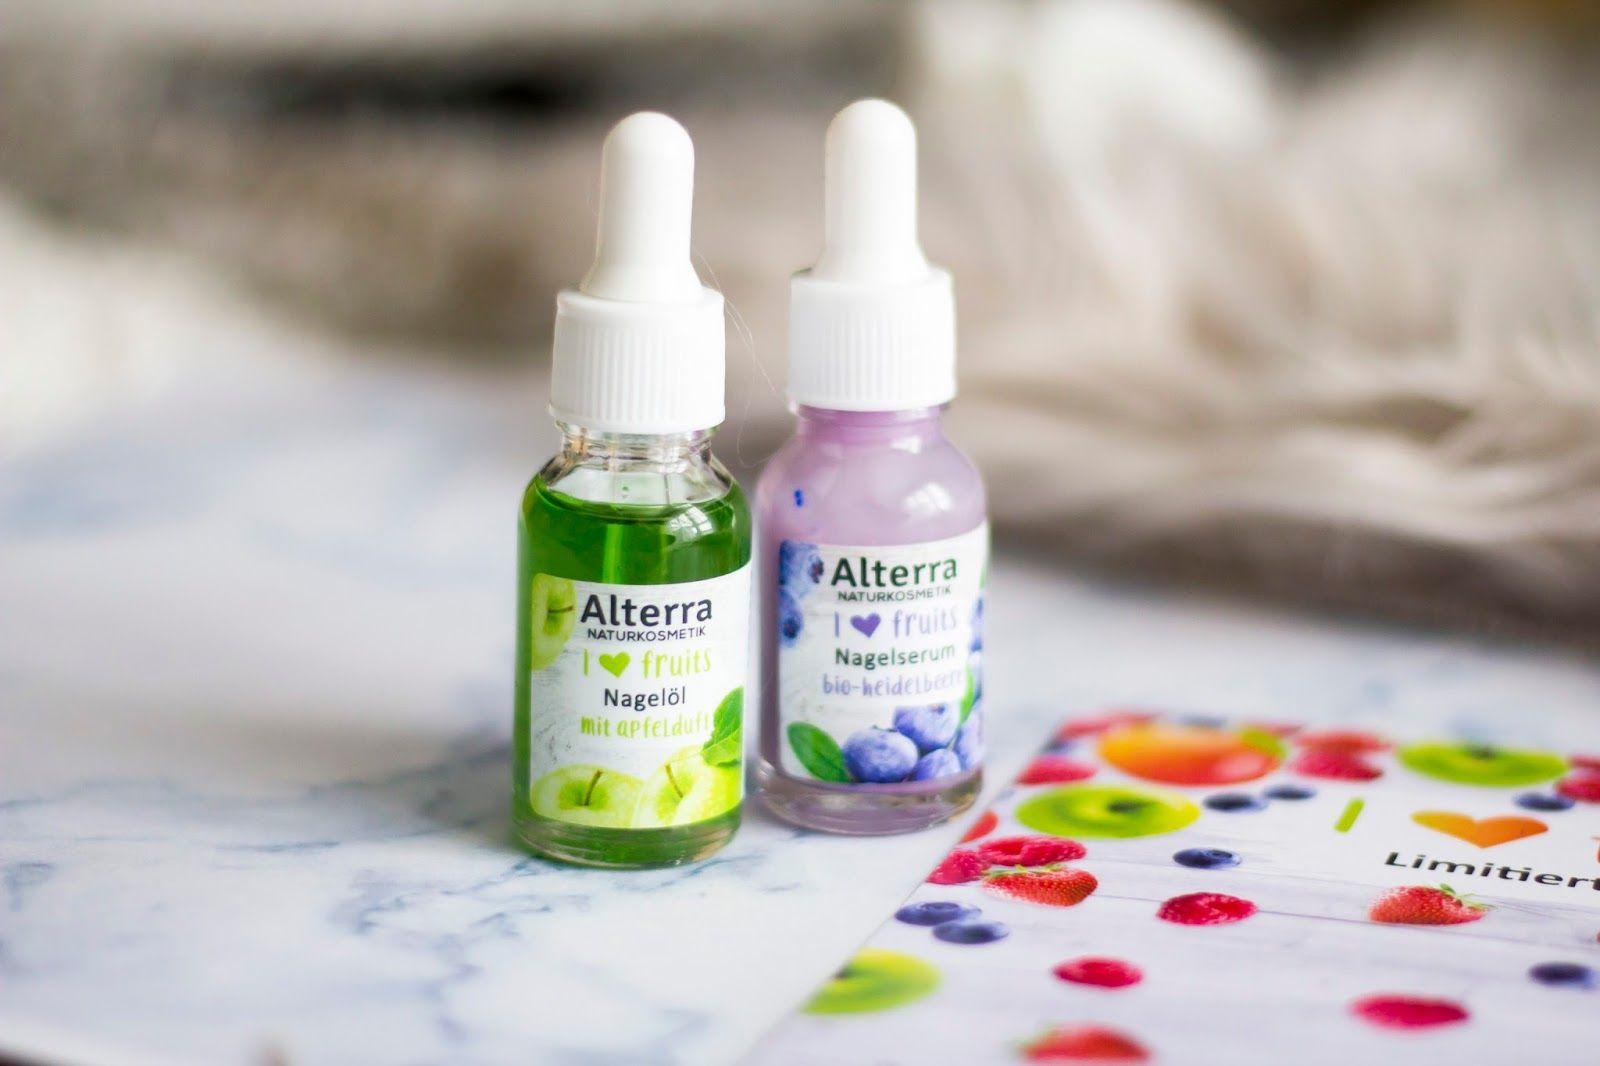 Alterra I Love Fruits Handcreme Nagelcreme Lippenbalsam